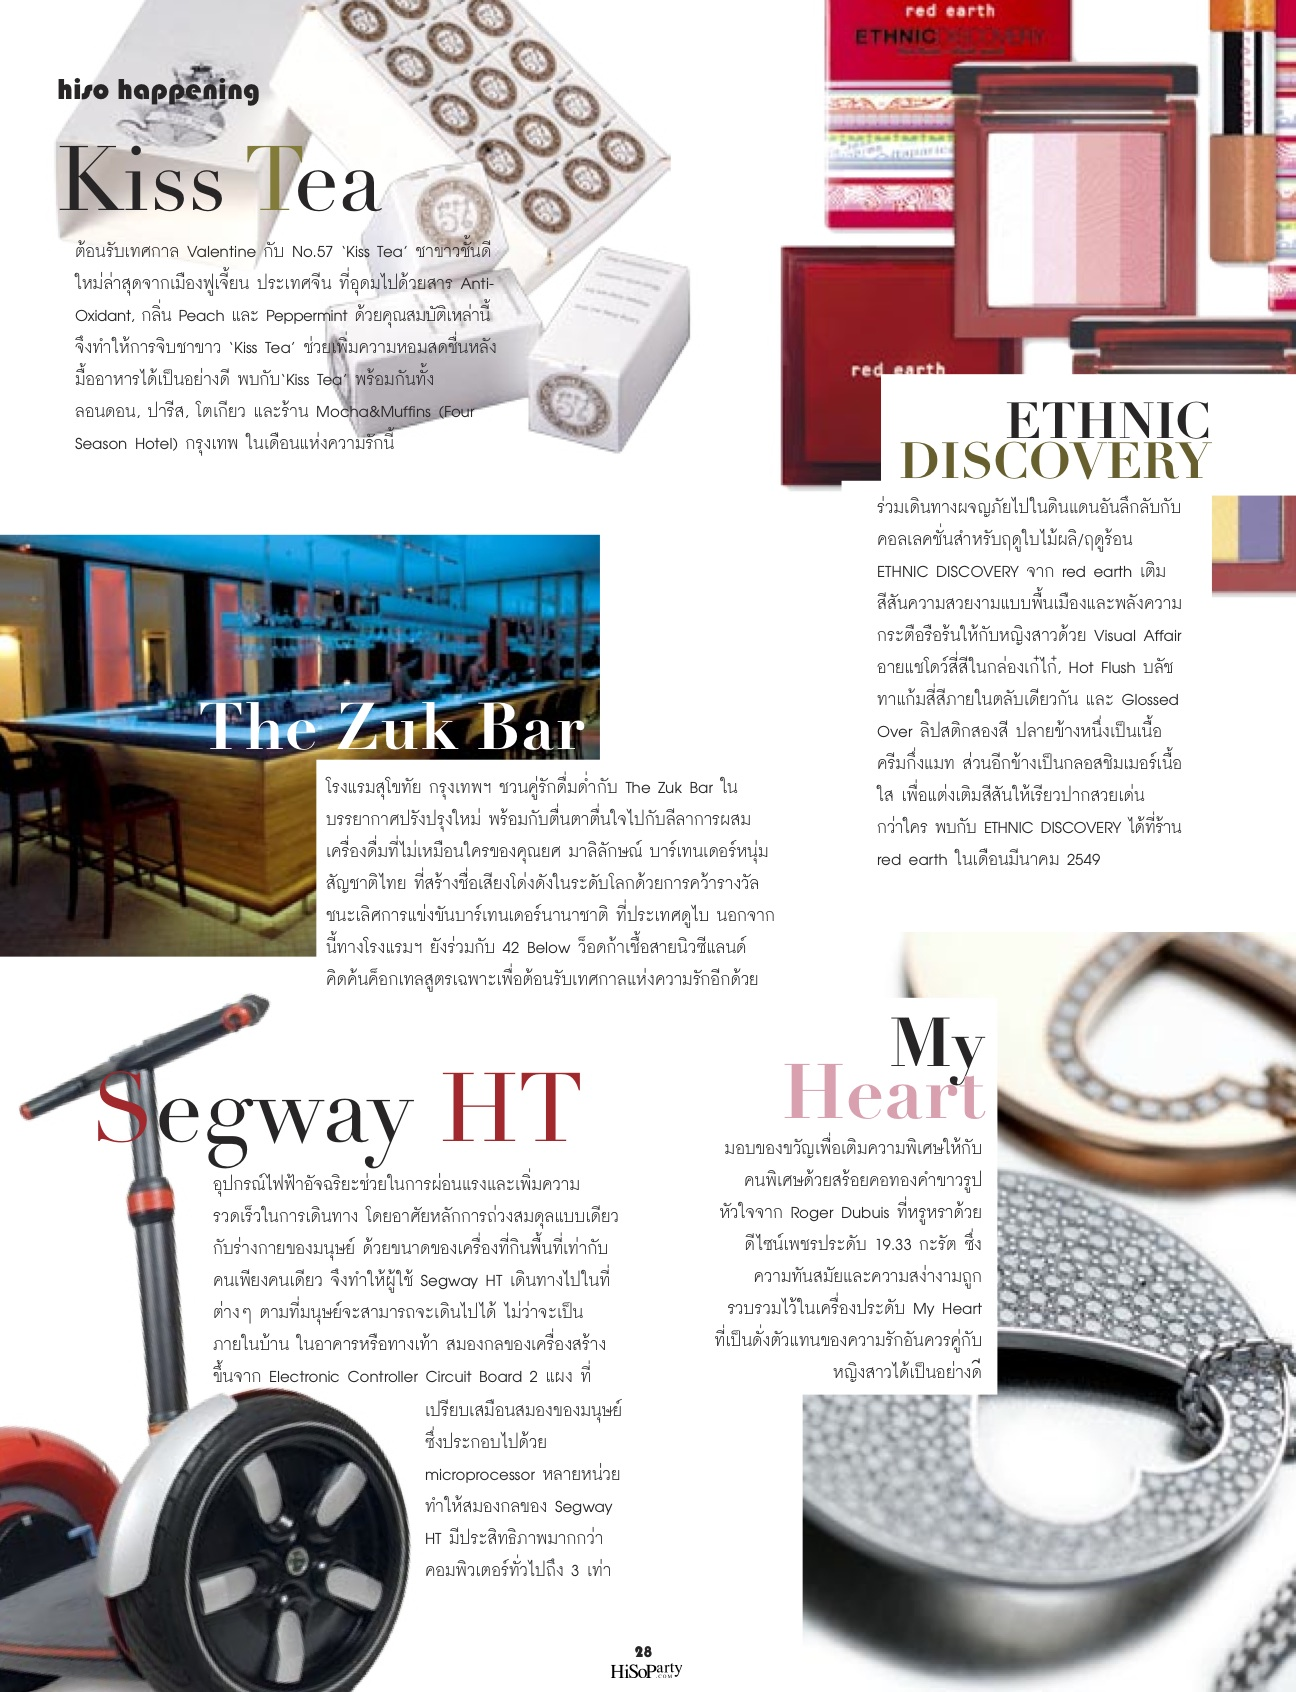 HiSo Magazine editorial -2009